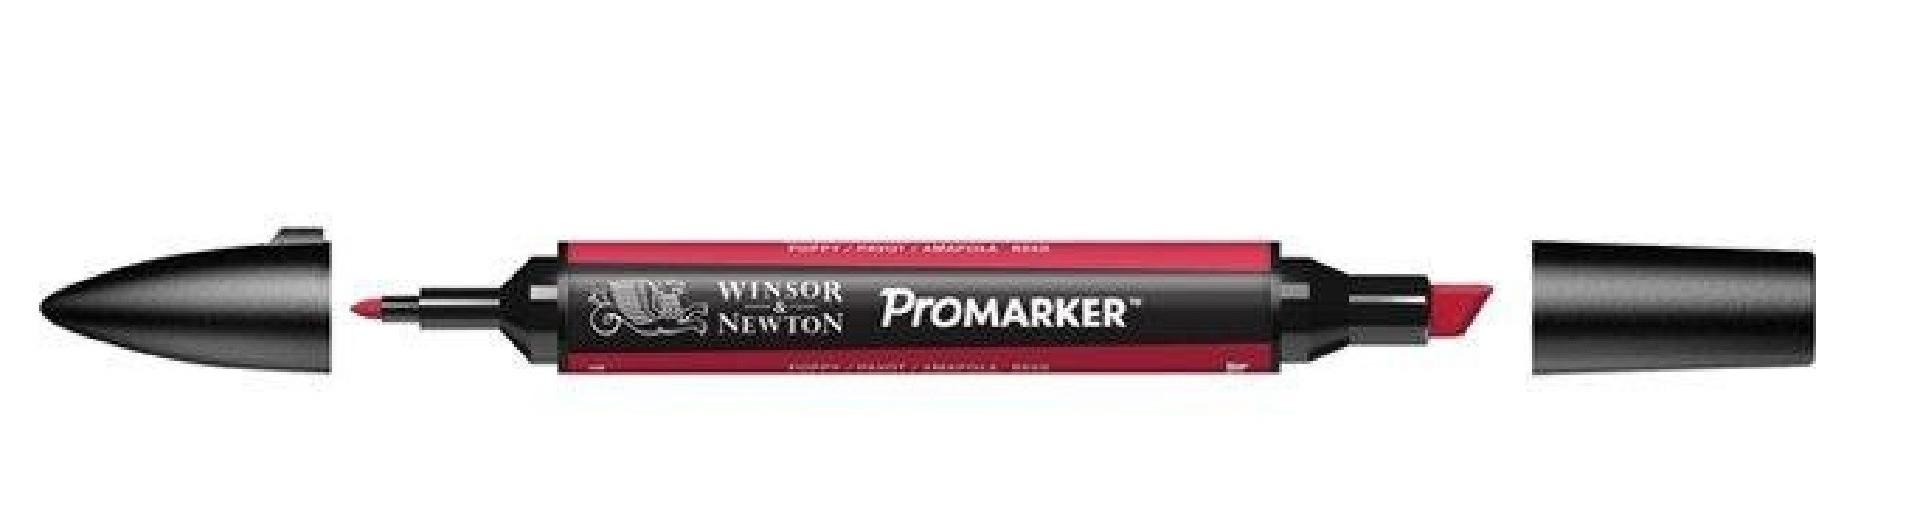 WINSOR & NEWTON - PROMARKER